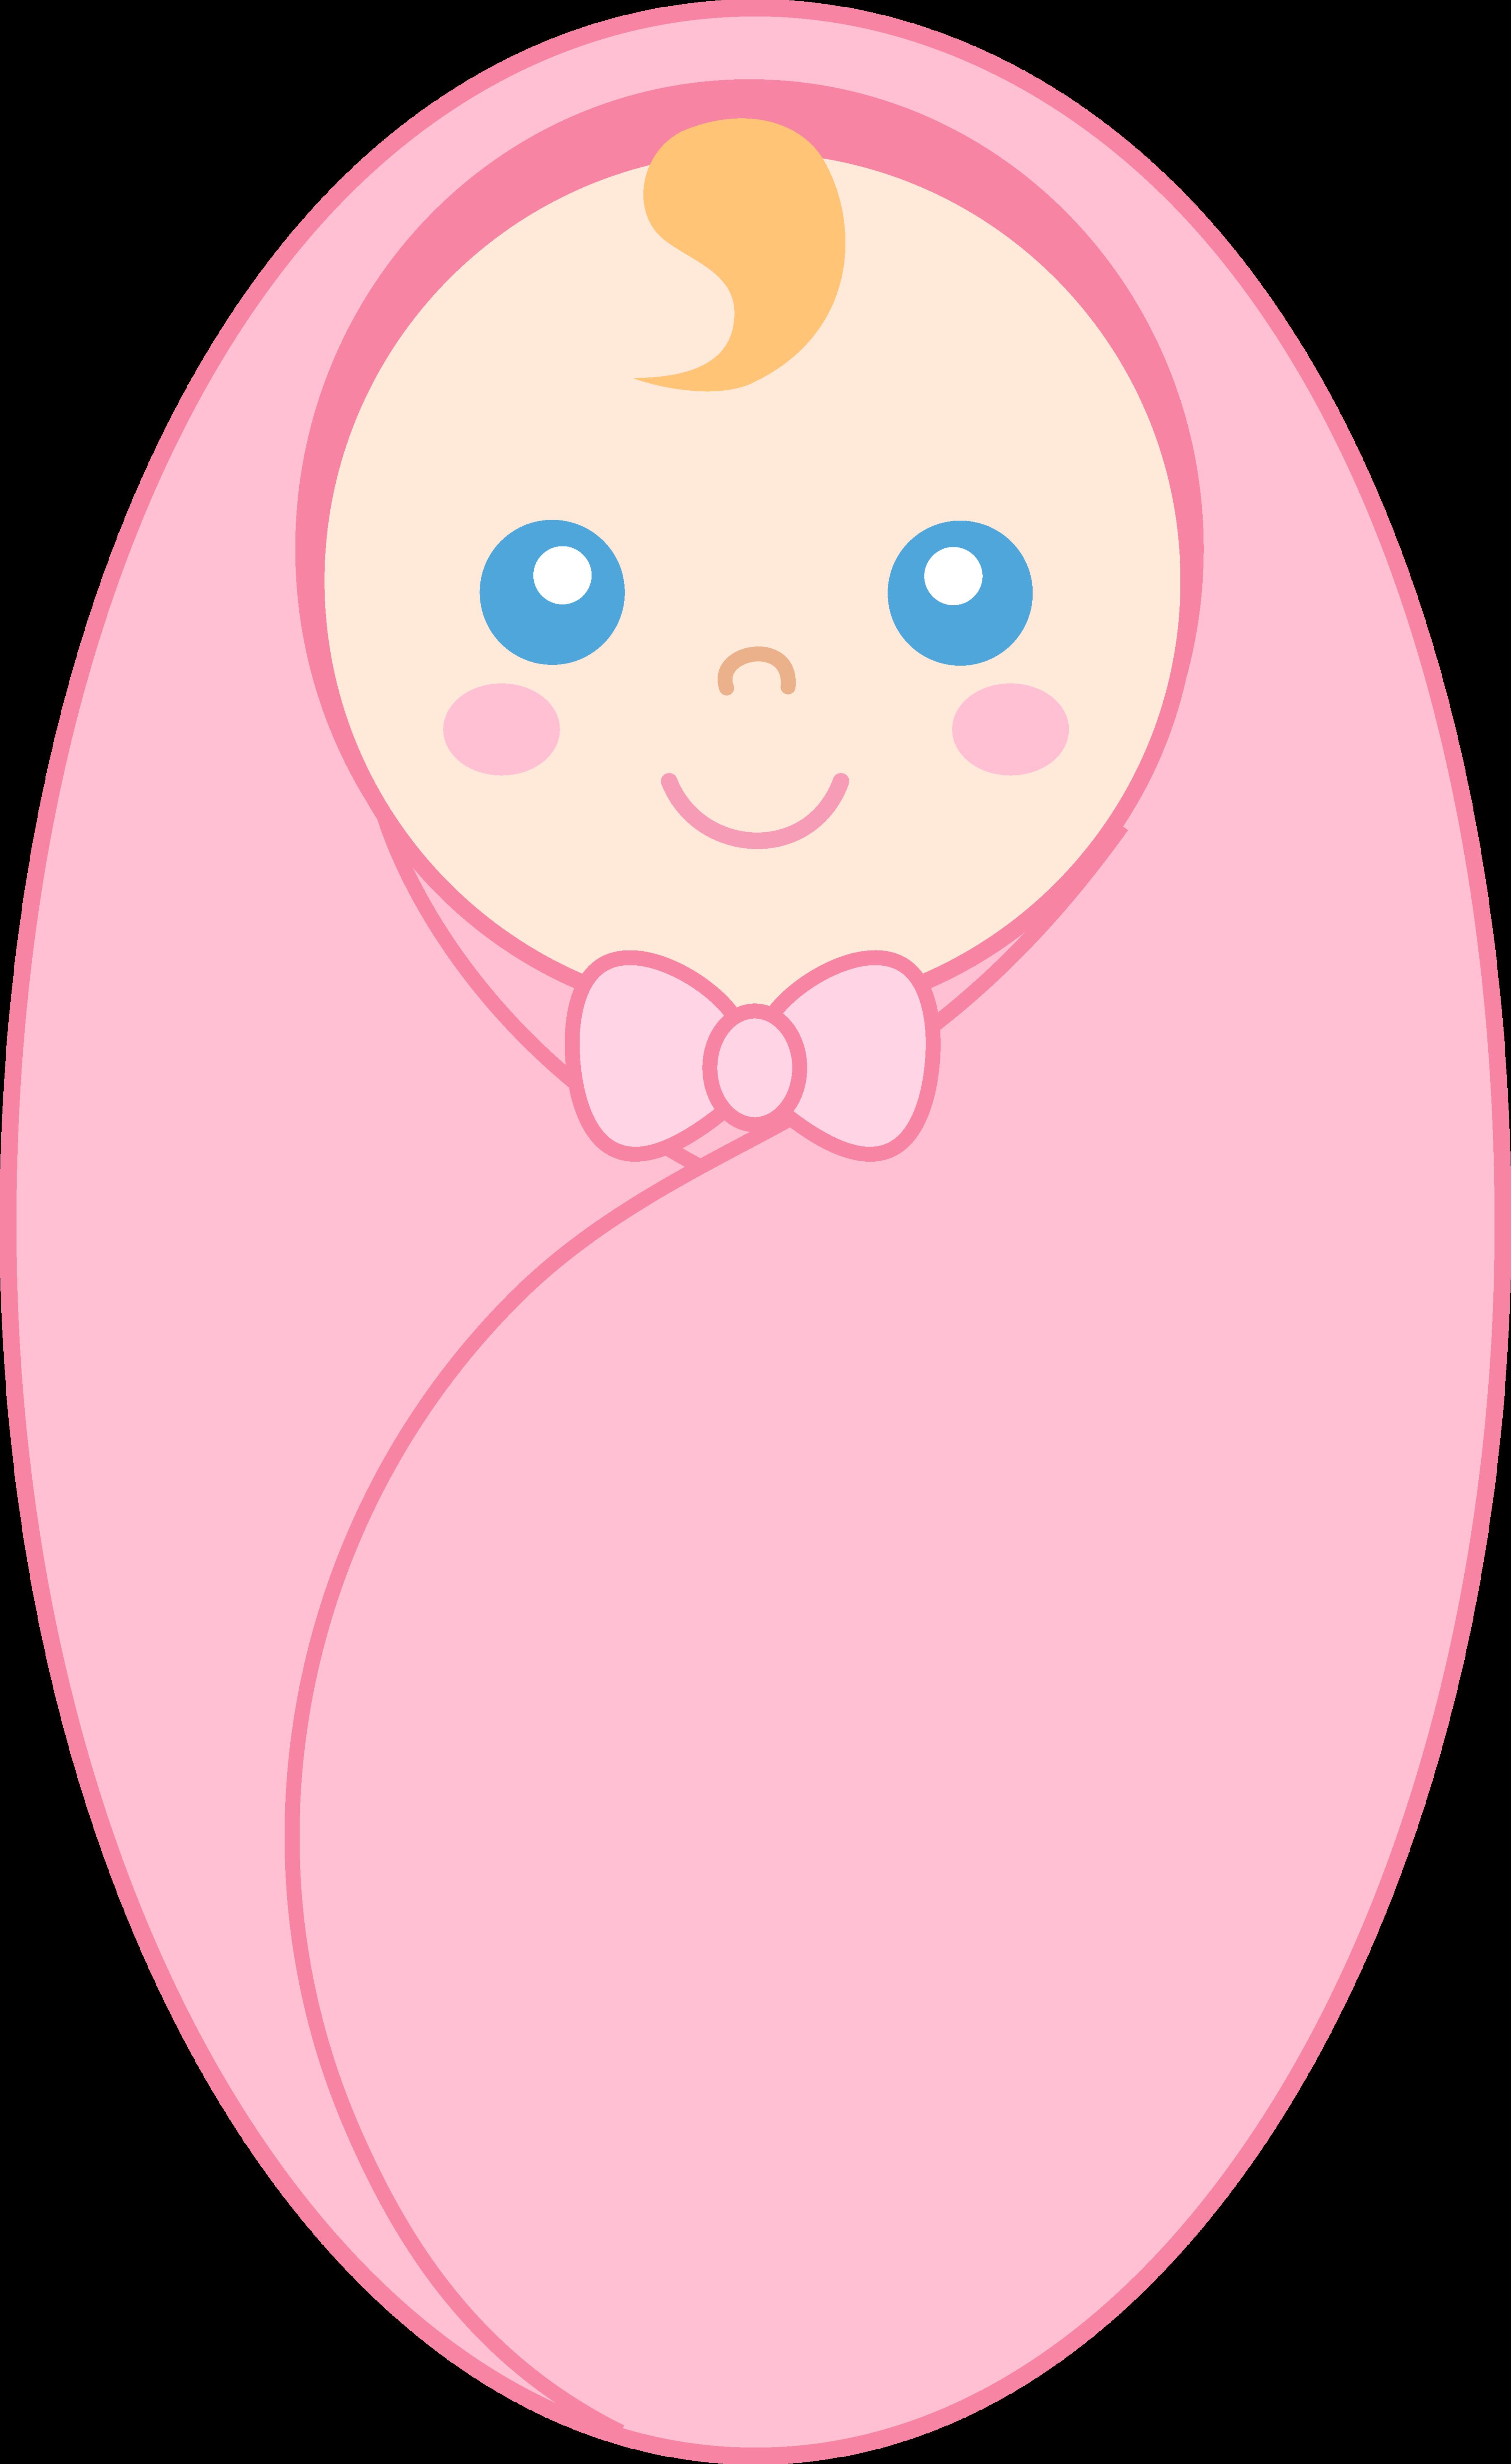 Newborn Baby Clipart-Newborn Baby Clipart-12